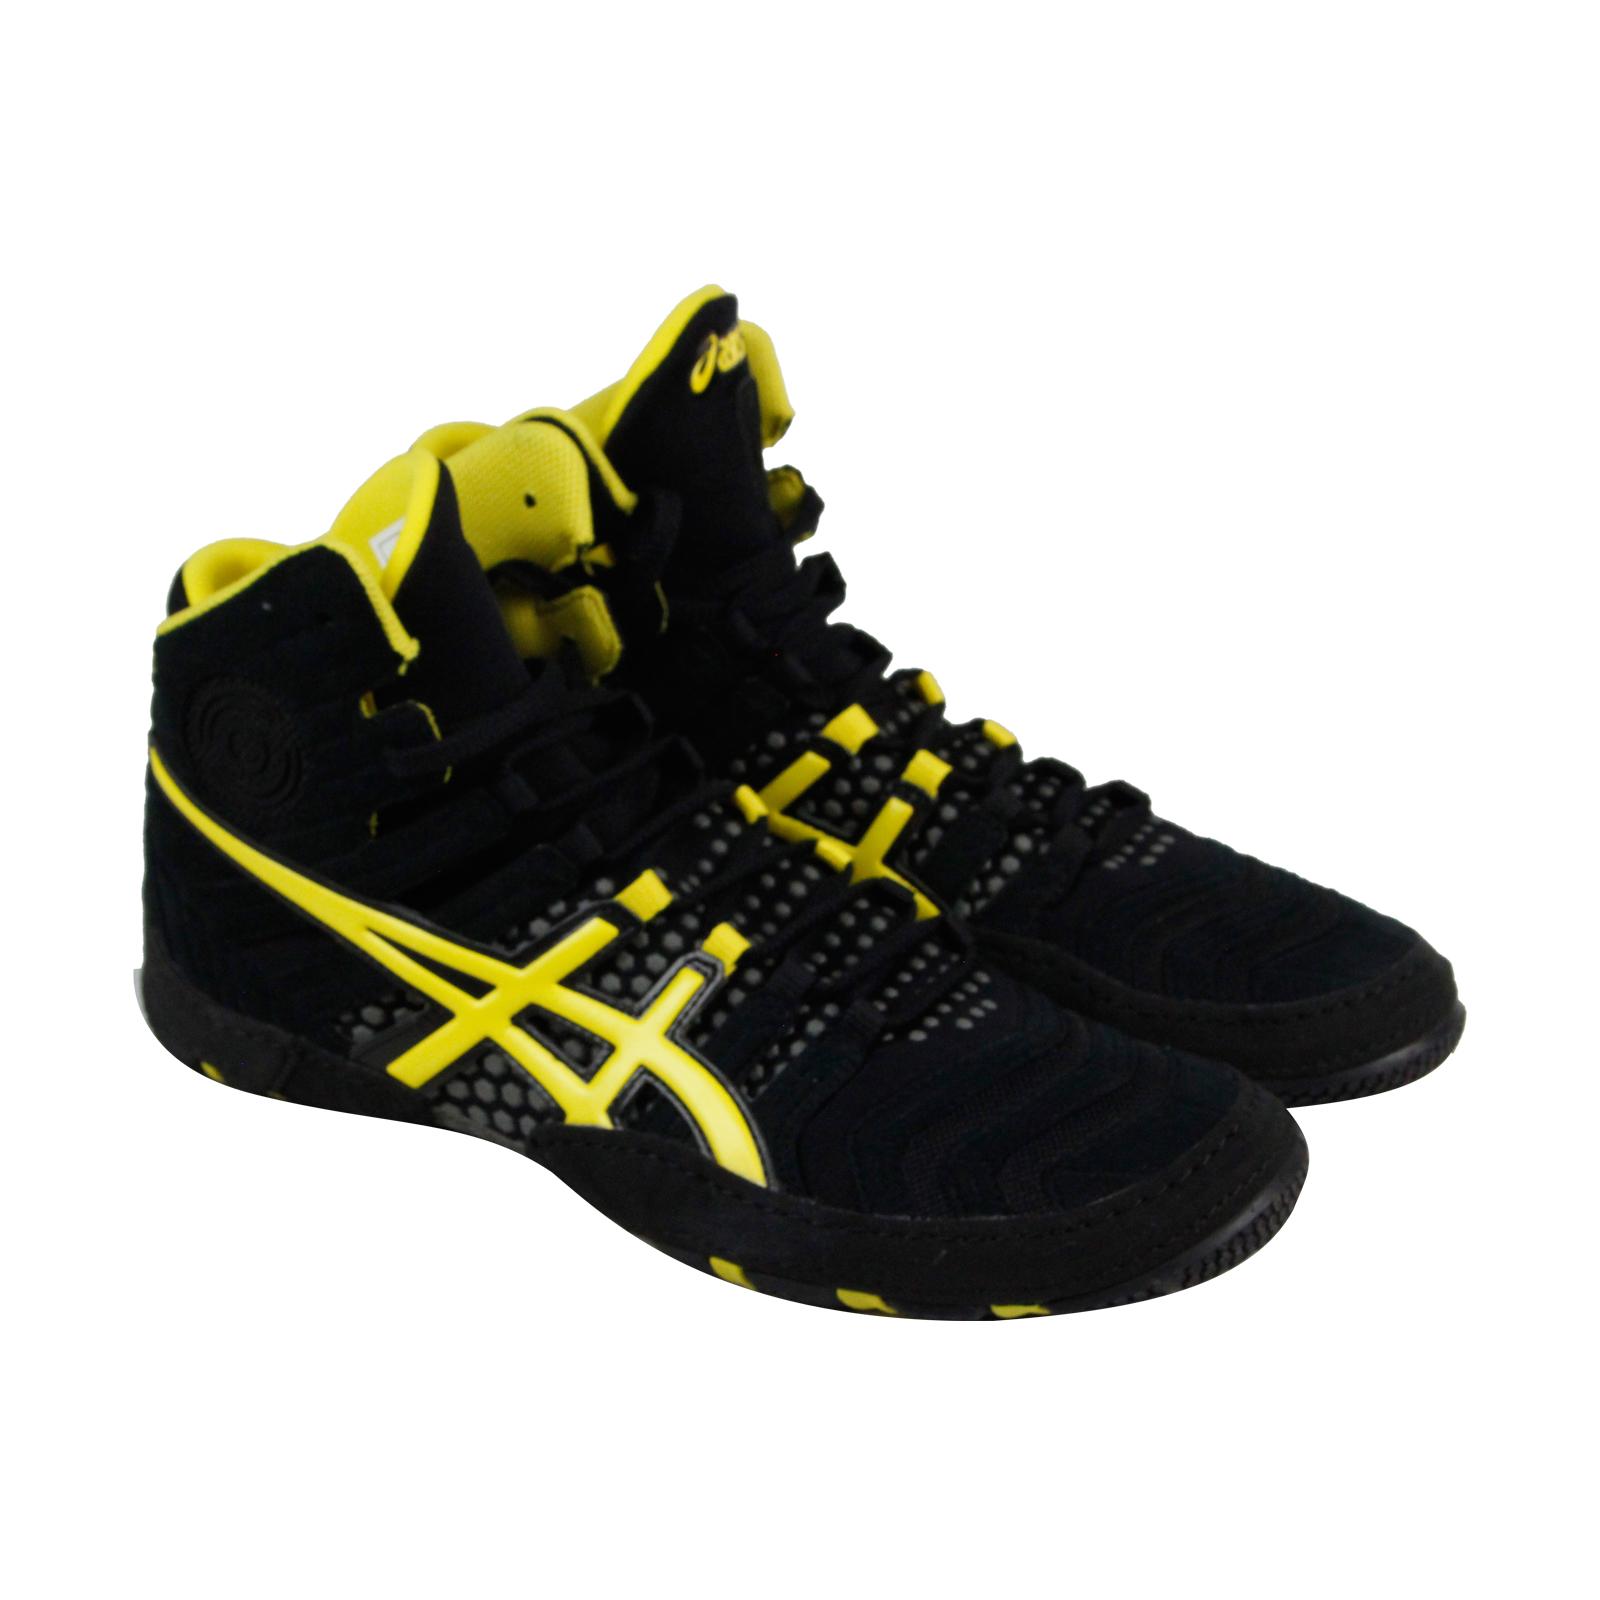 Asics Dan Gable Ultimate 4 Mens Black Suede Athletic Wrestling shoes